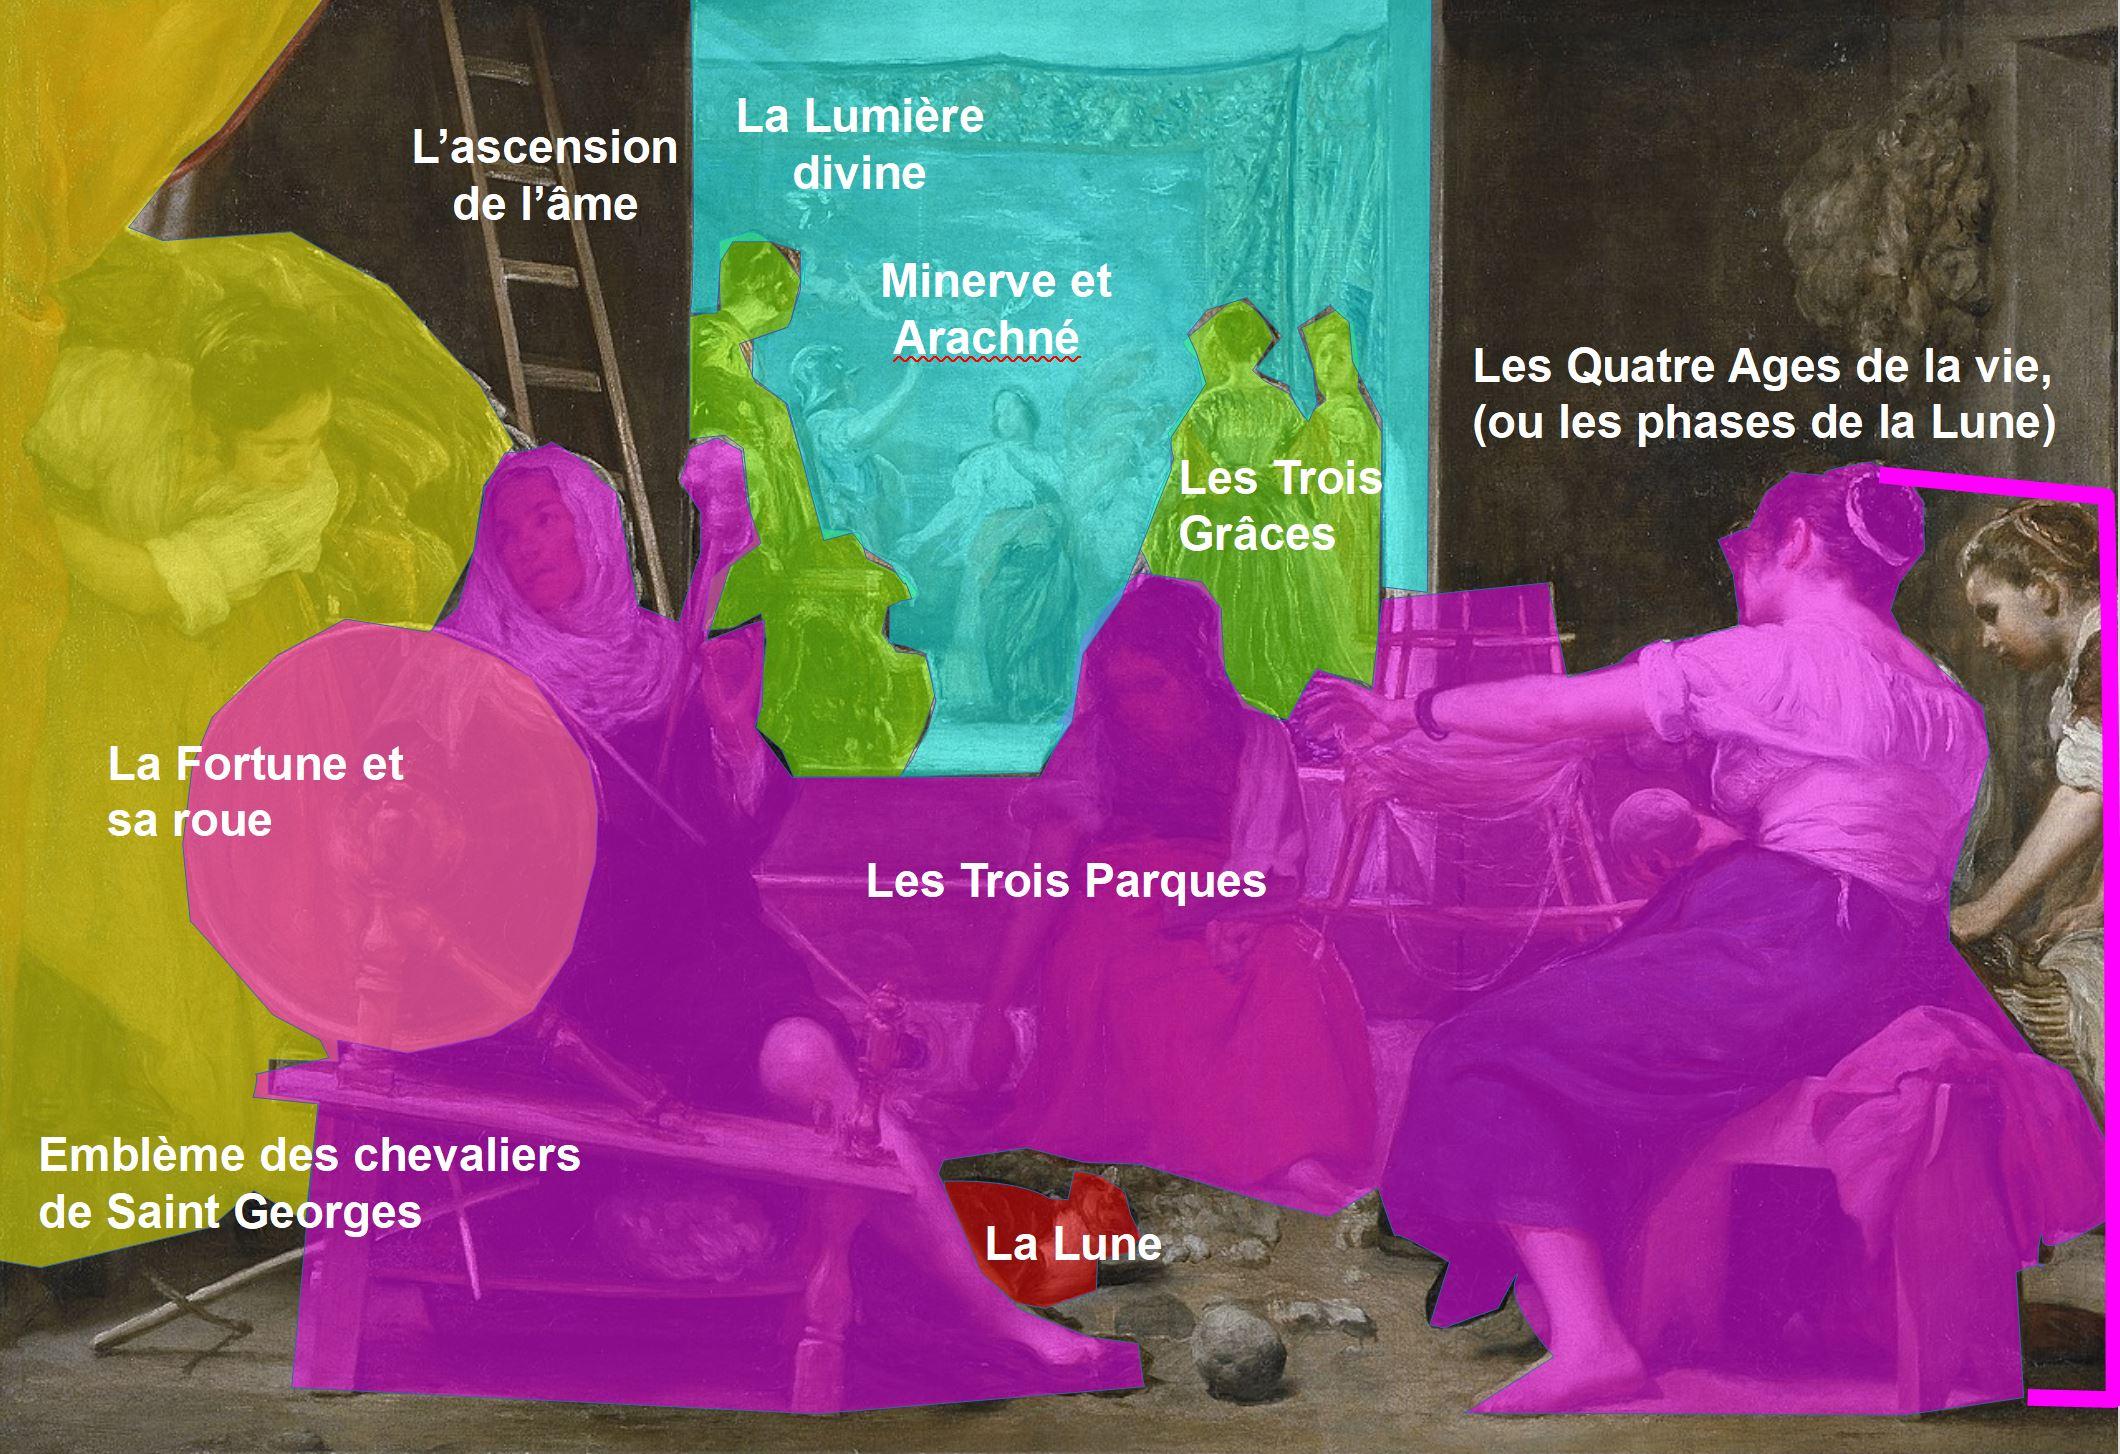 Velazquez 1657 las_hilanderas Prado Stapleford Potter schema